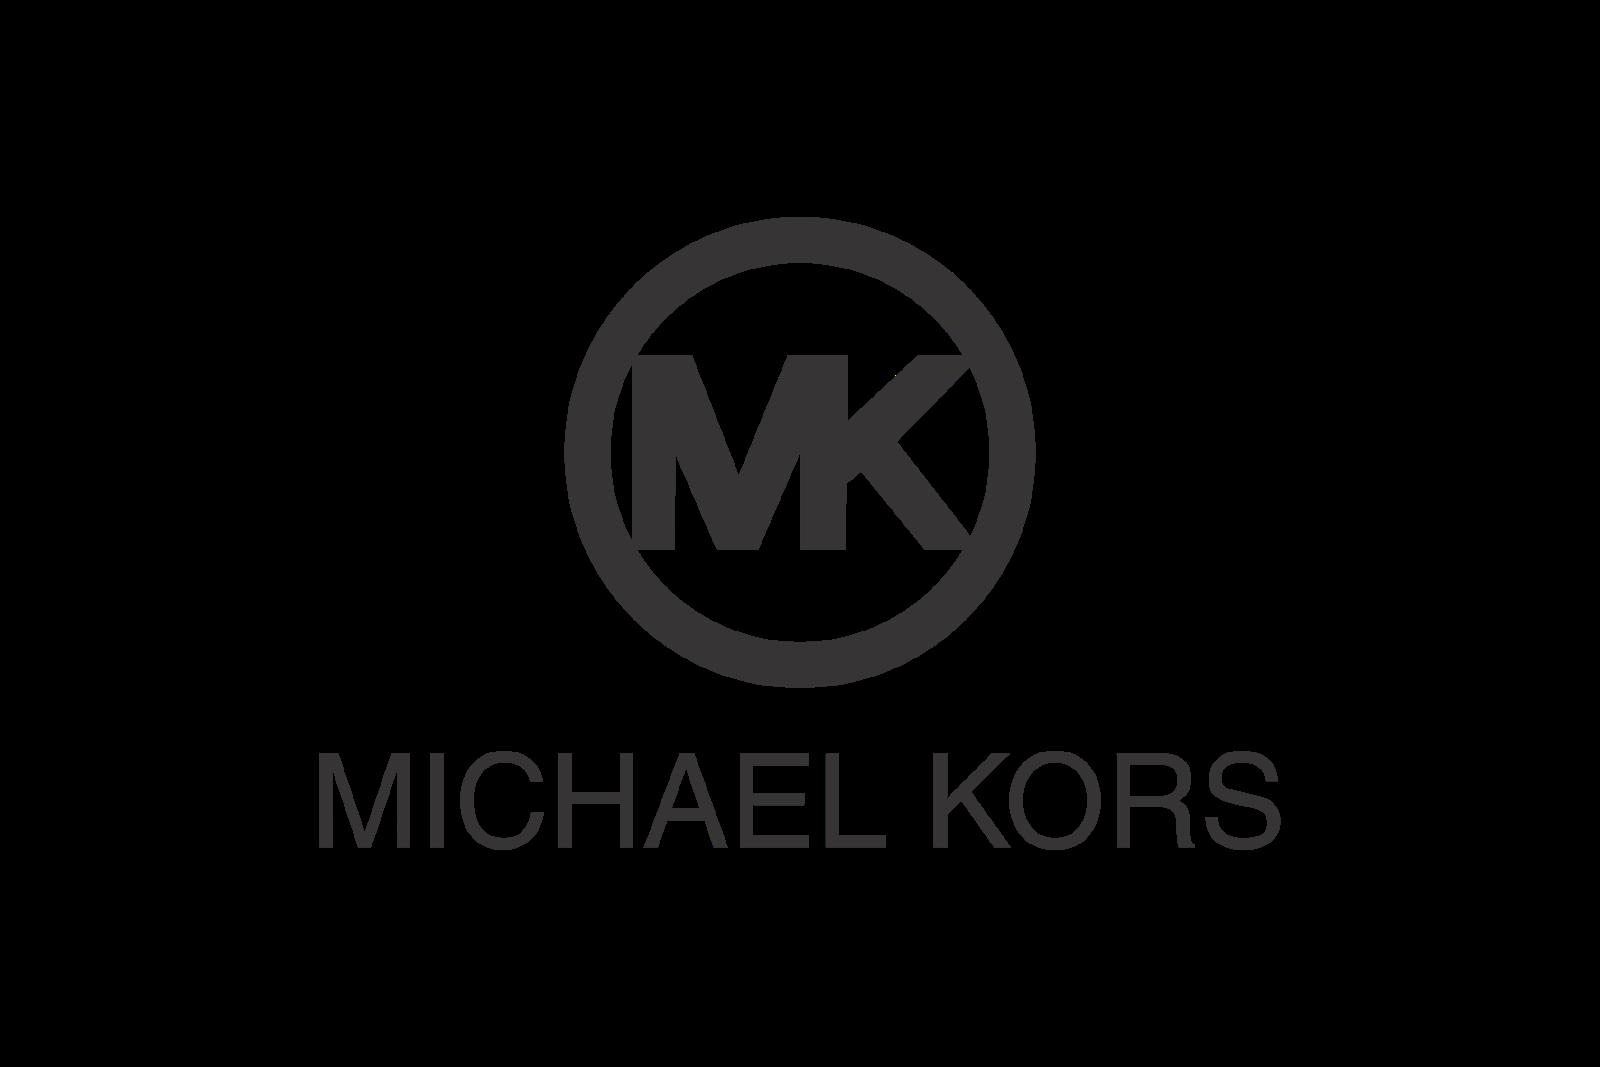 MIChael kors .png